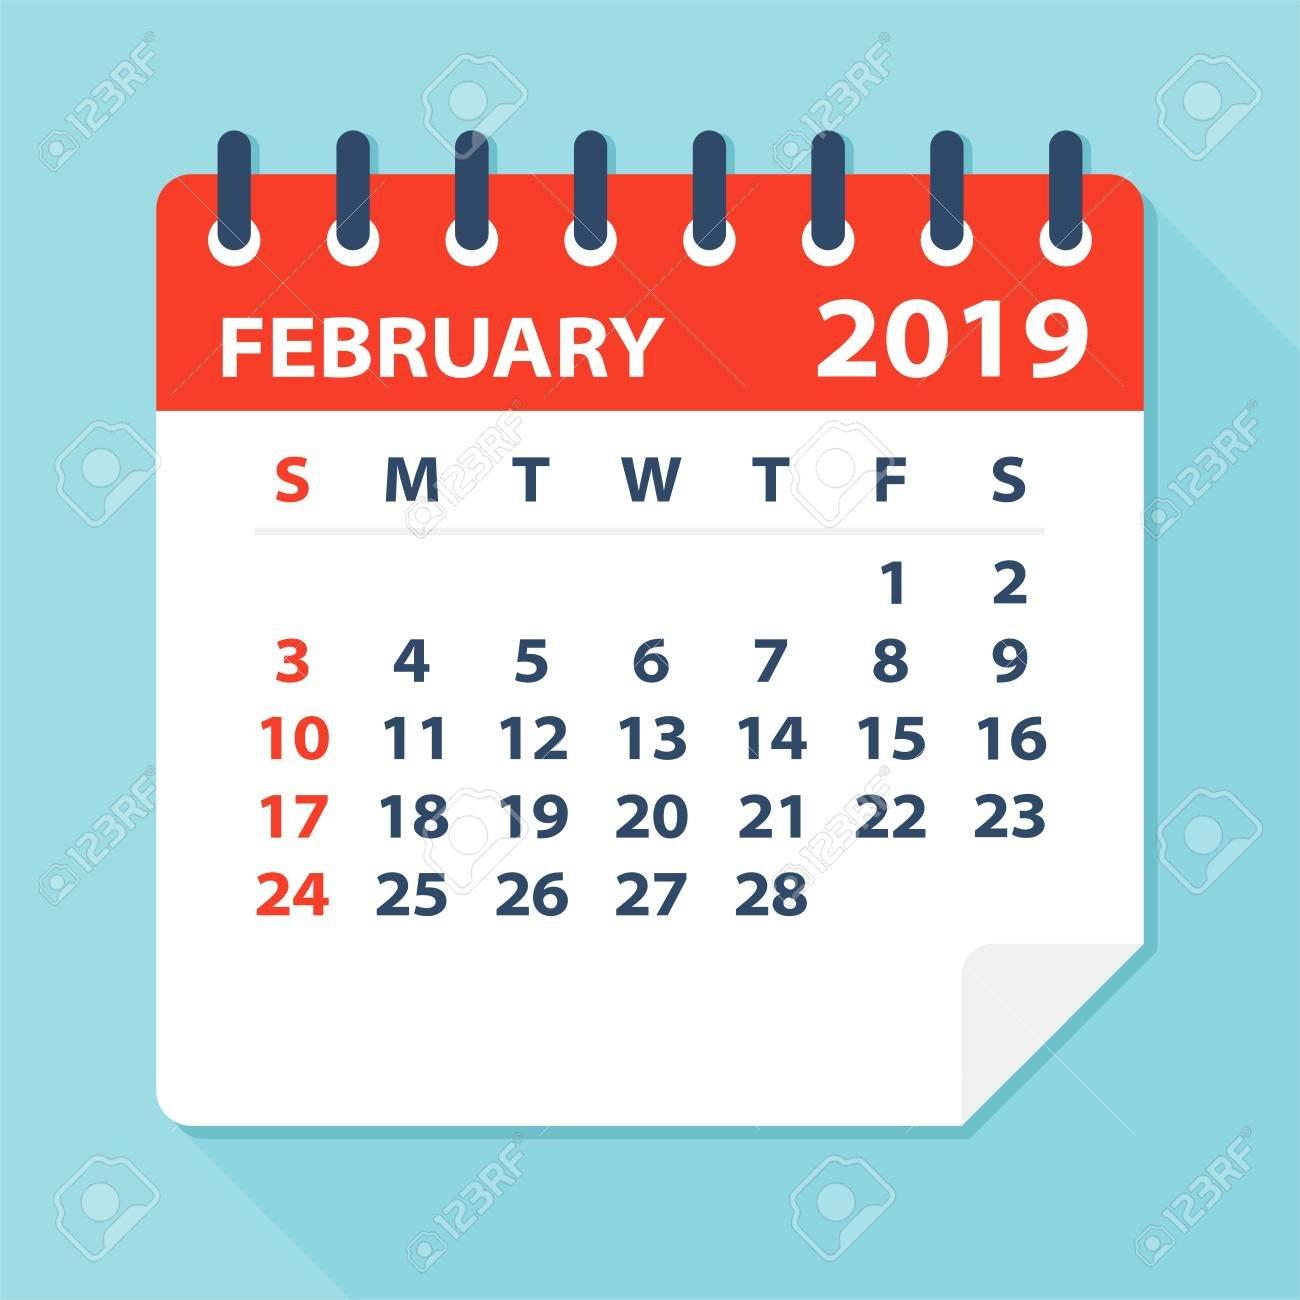 February 2019 Calendar Leaf - Illustration. Vector Graphic Page Calendar 2019 Clipart